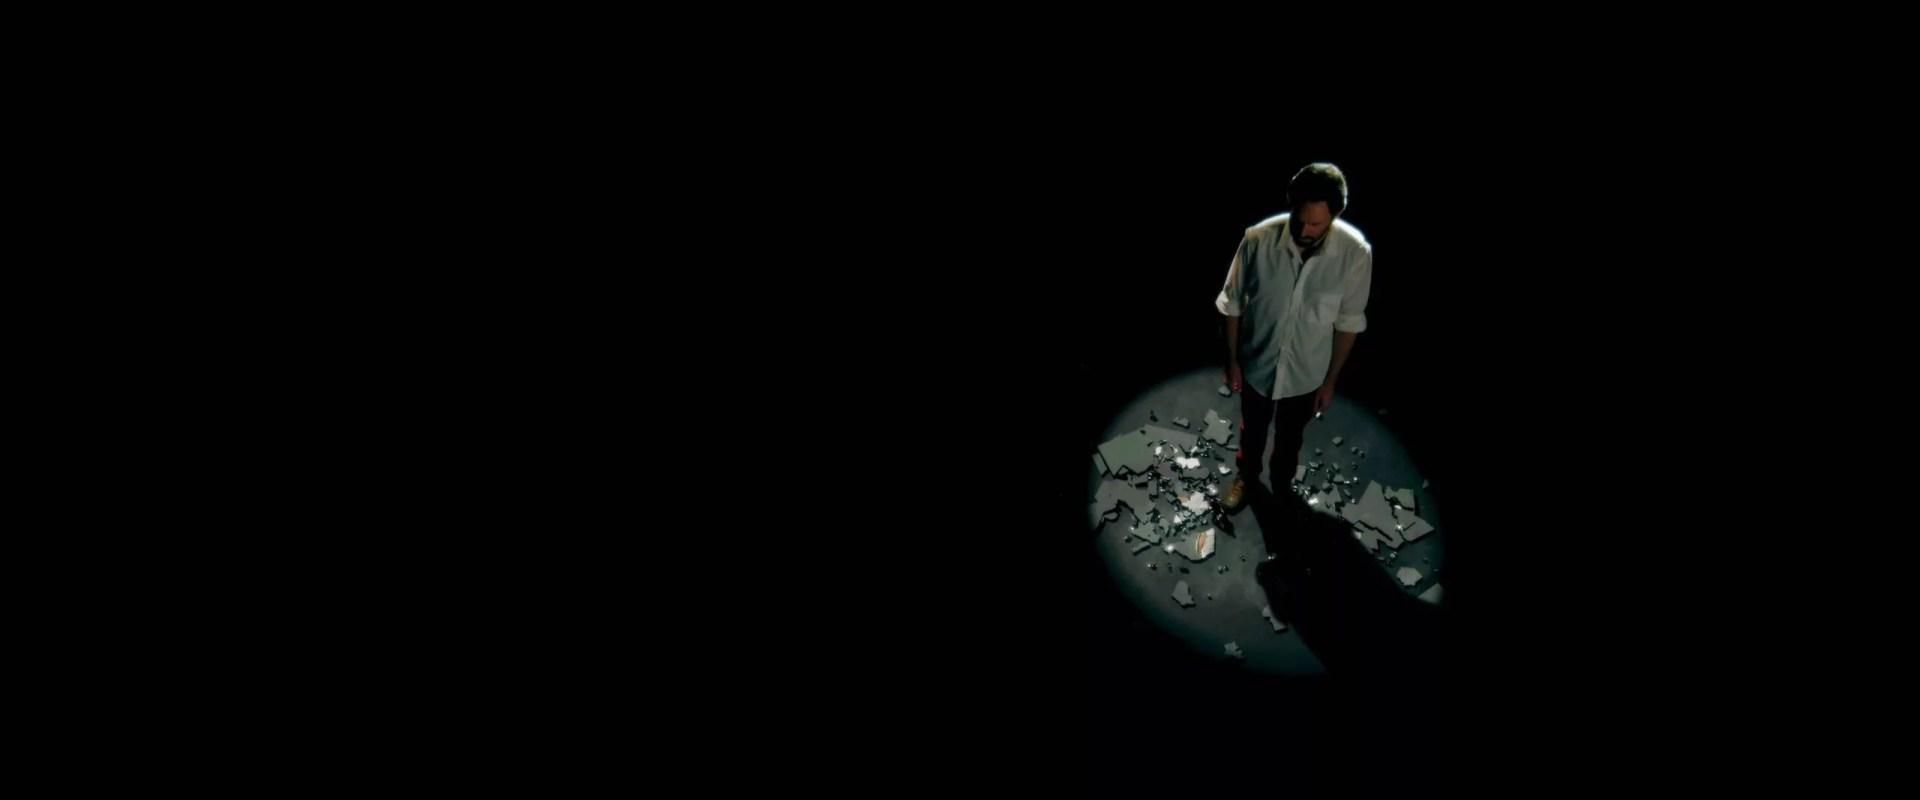 frame grab of a man under a spotlight standing on pieces of a broken mirror